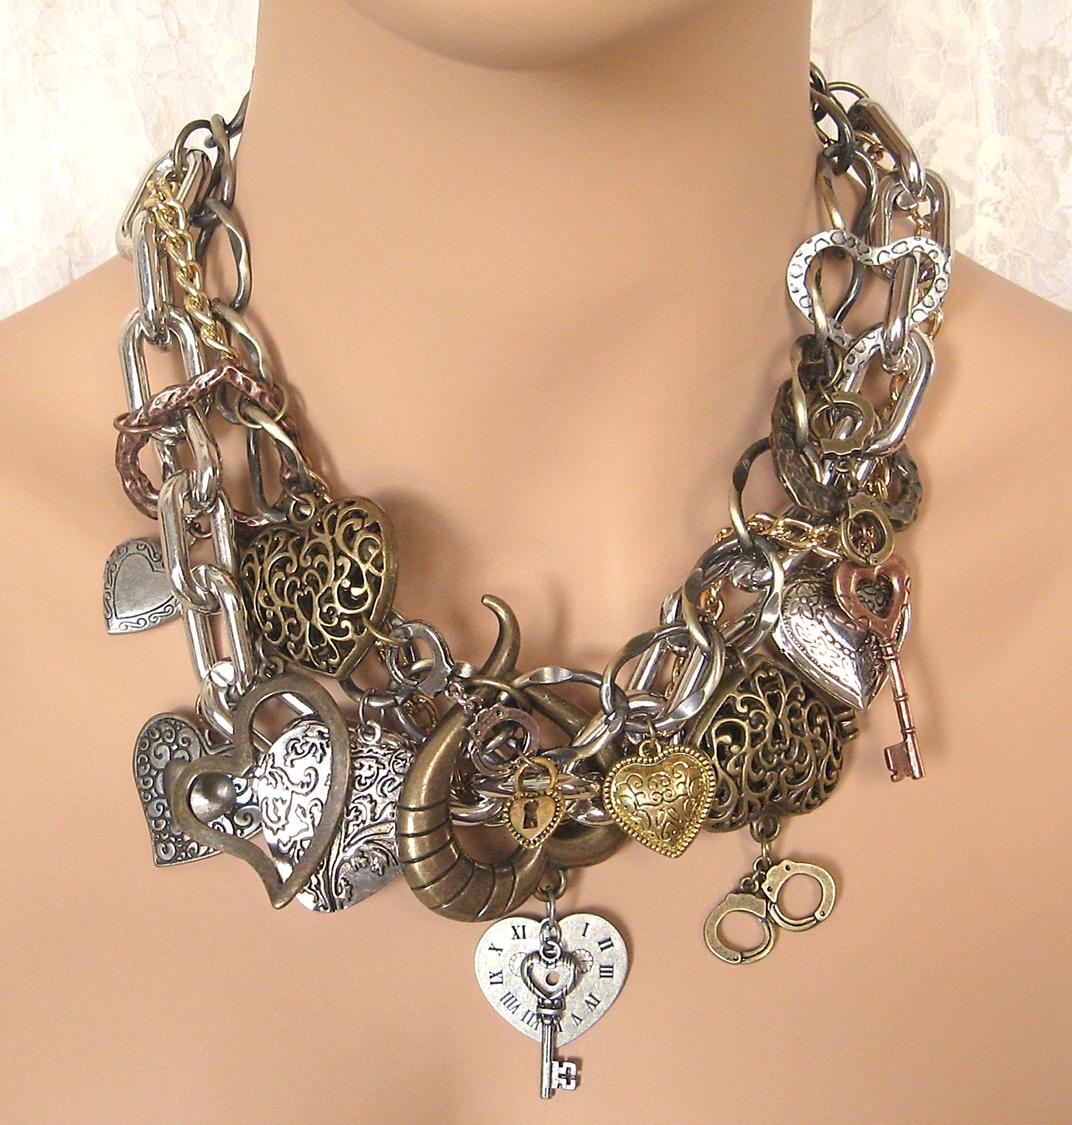 Unchain My Heart Chunky Charm Necklace